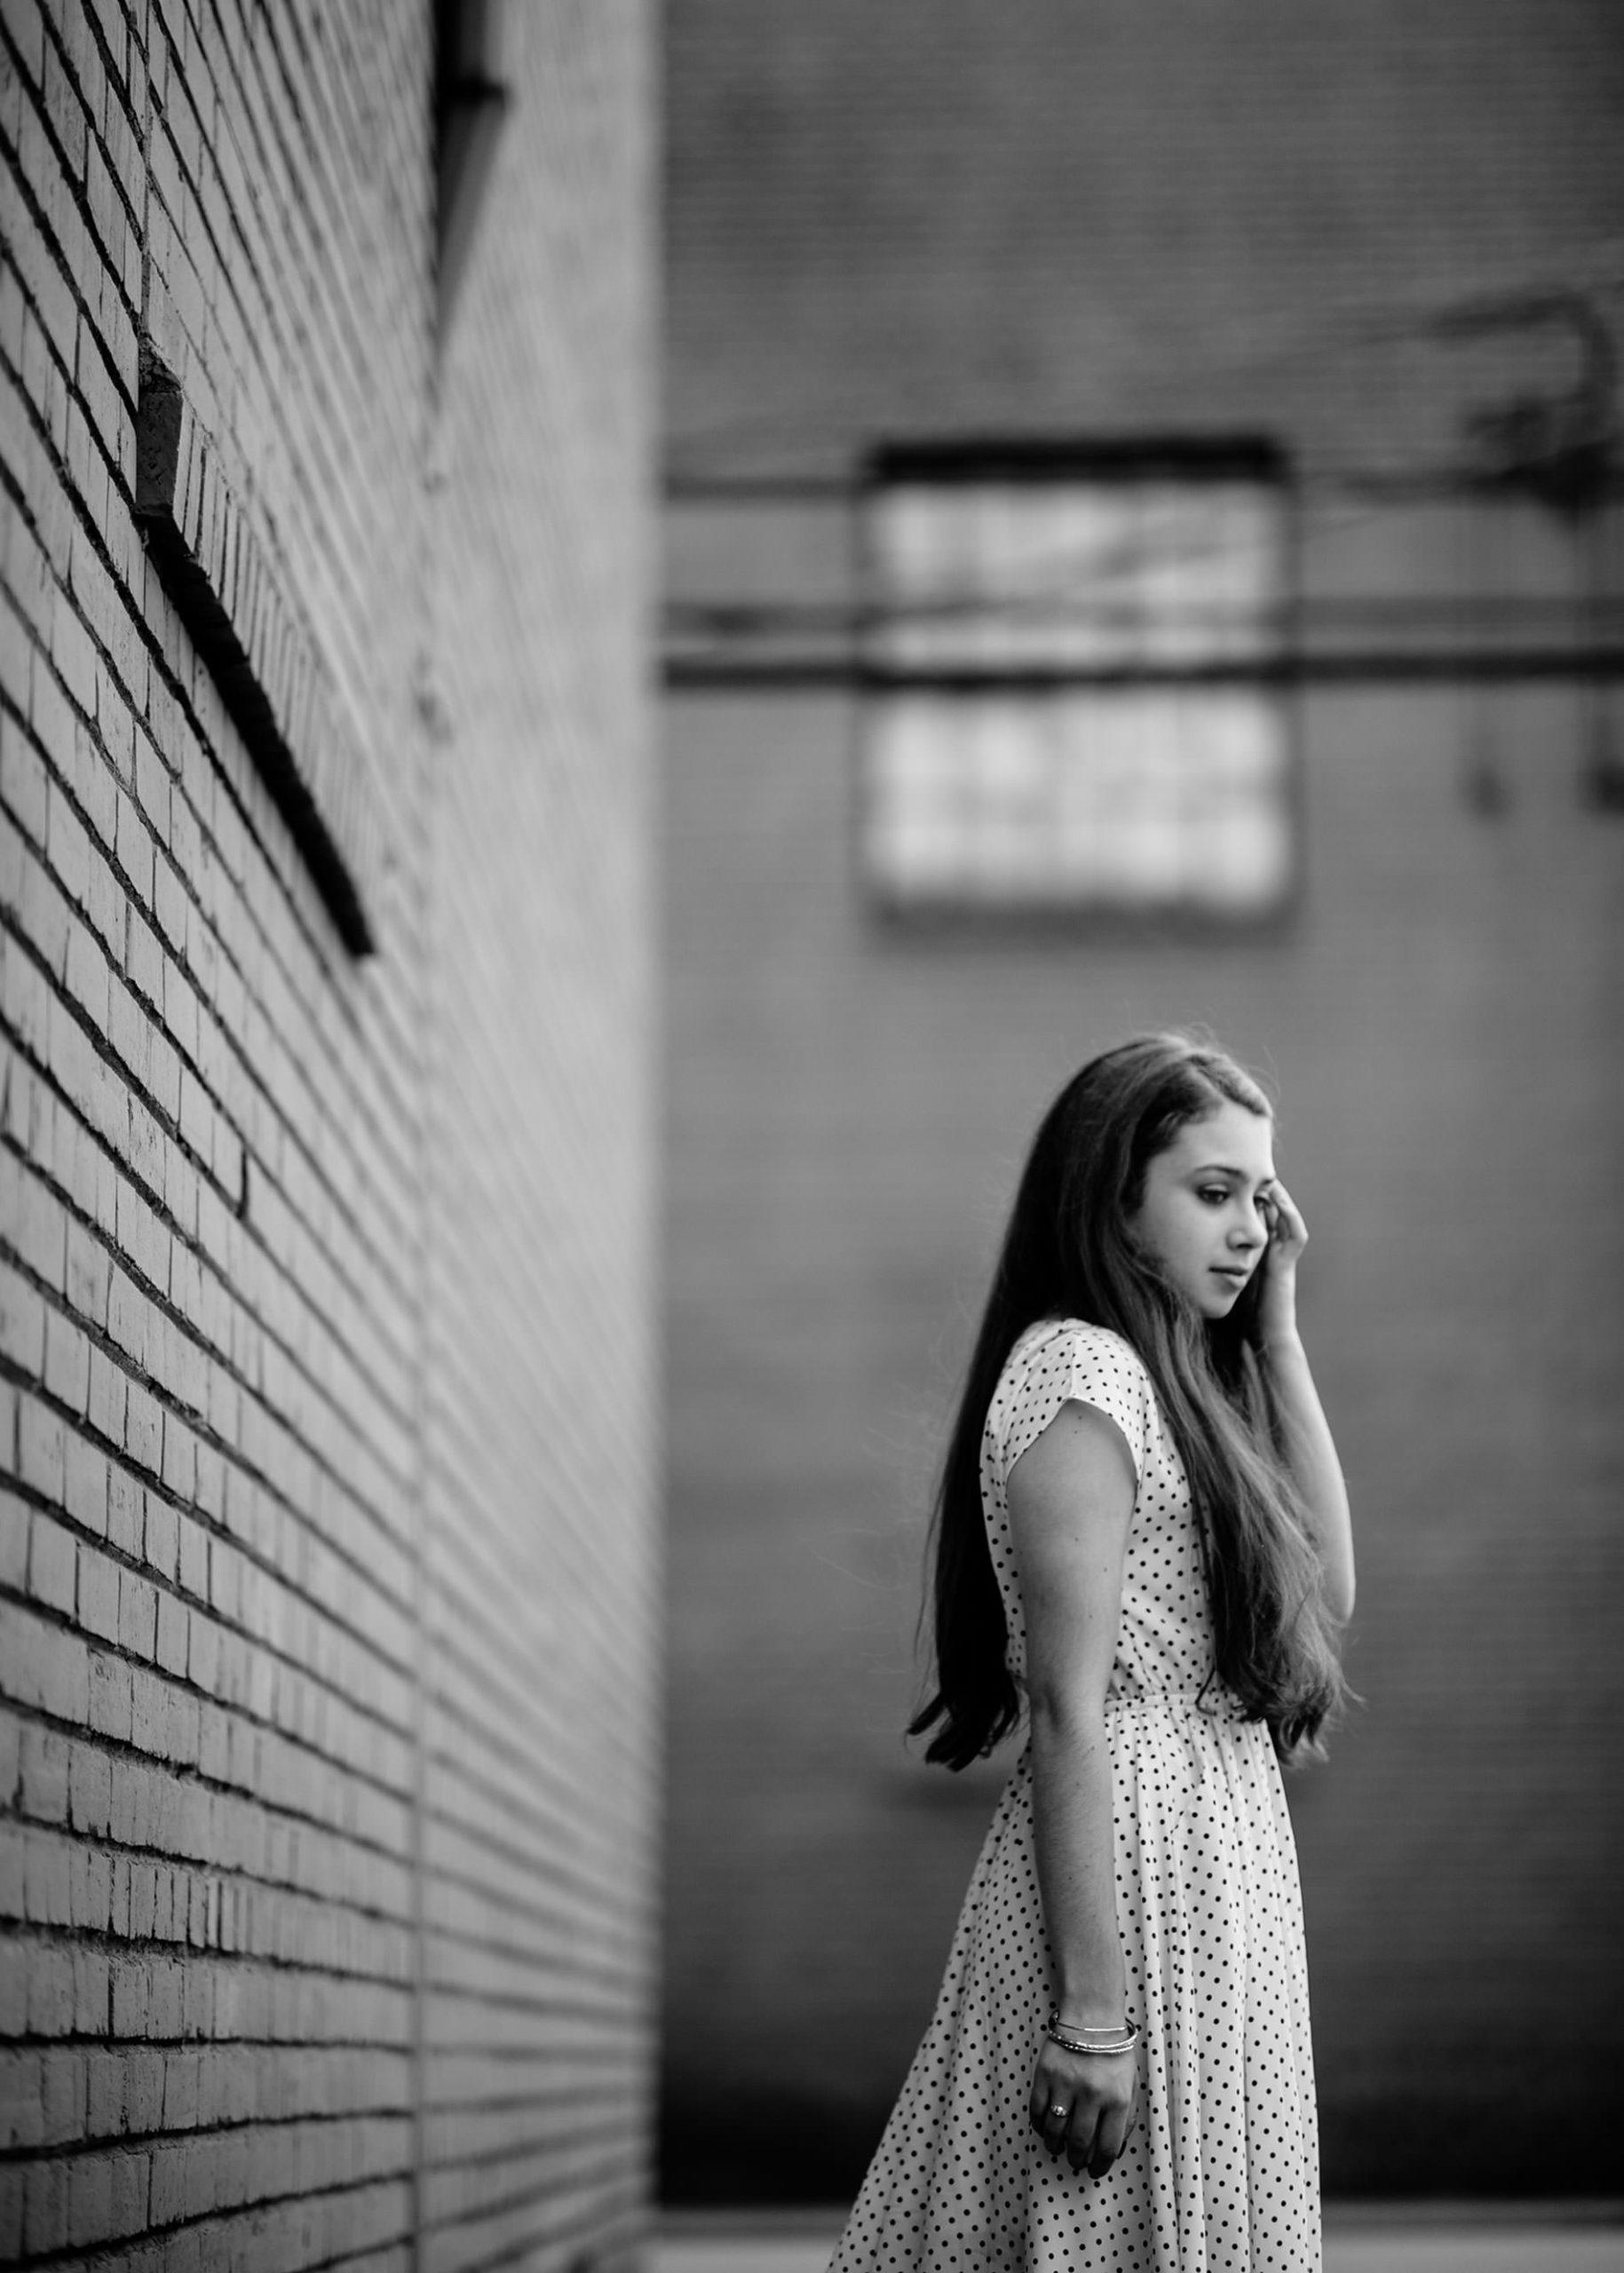 wv senior portrait photographer oberports portfolio